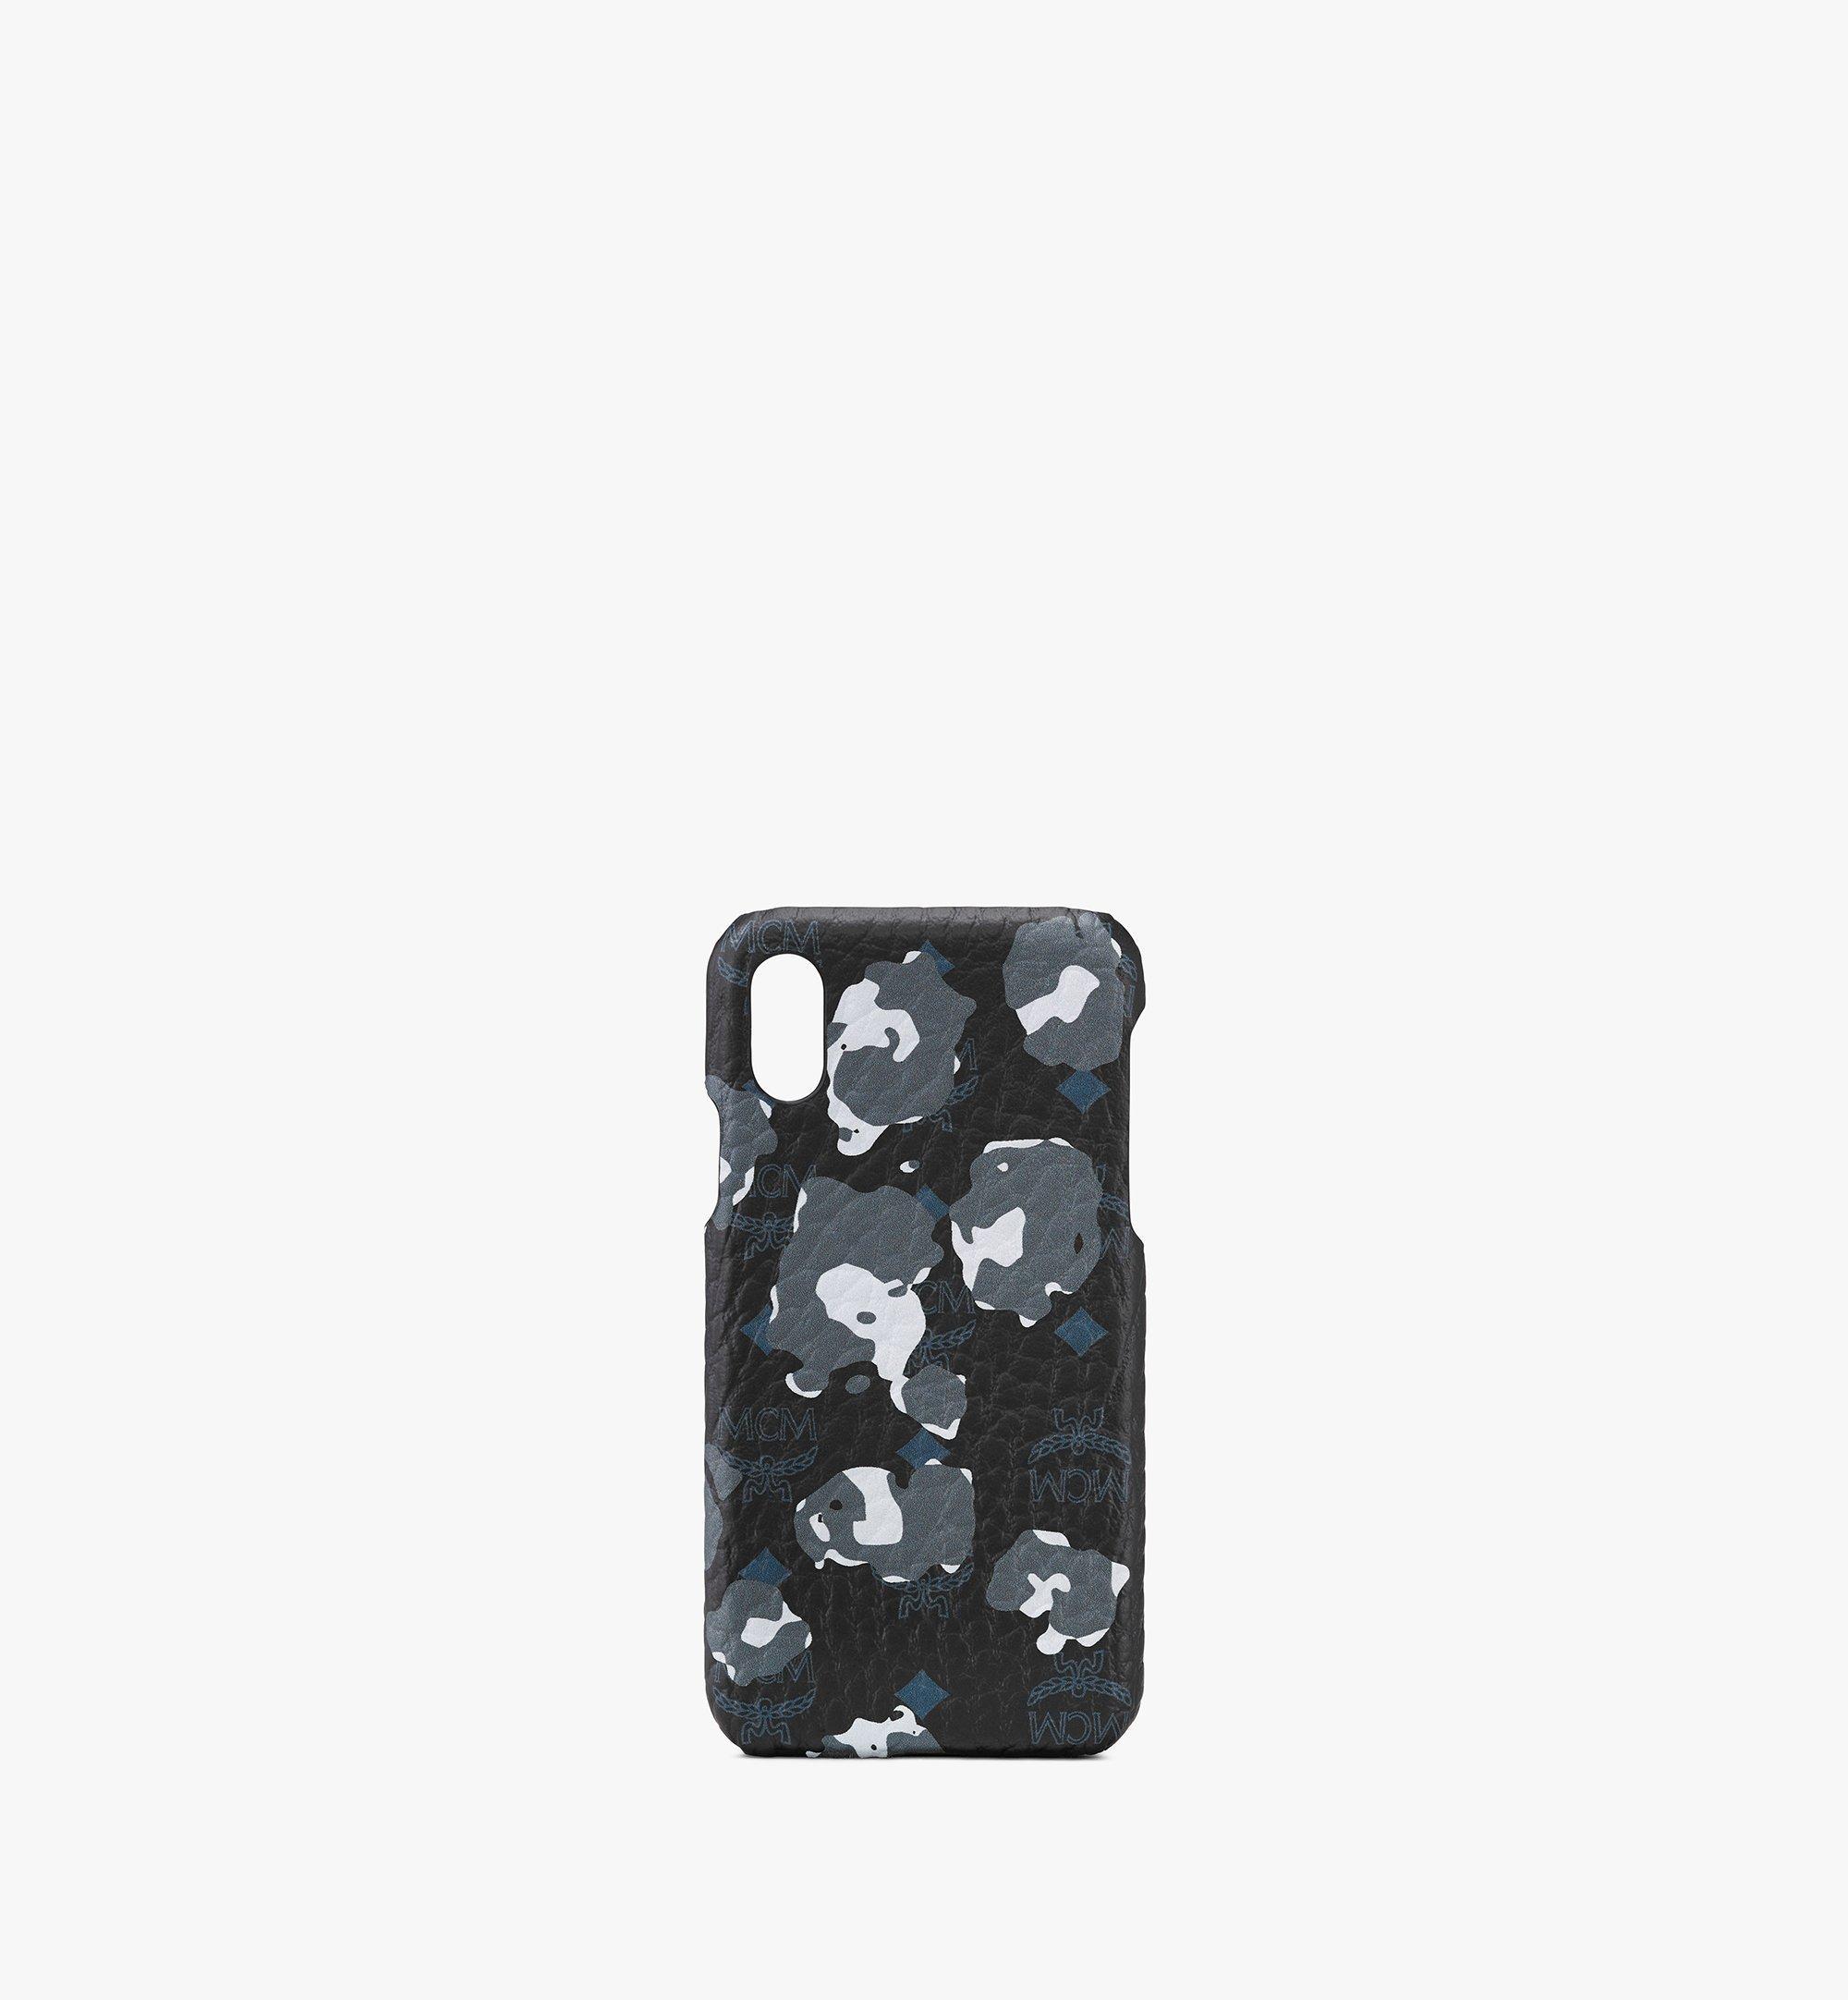 MCM iPhone X/XS ケース - フローラルレオパード Black MXEASLF01B1001 Alternate View 1